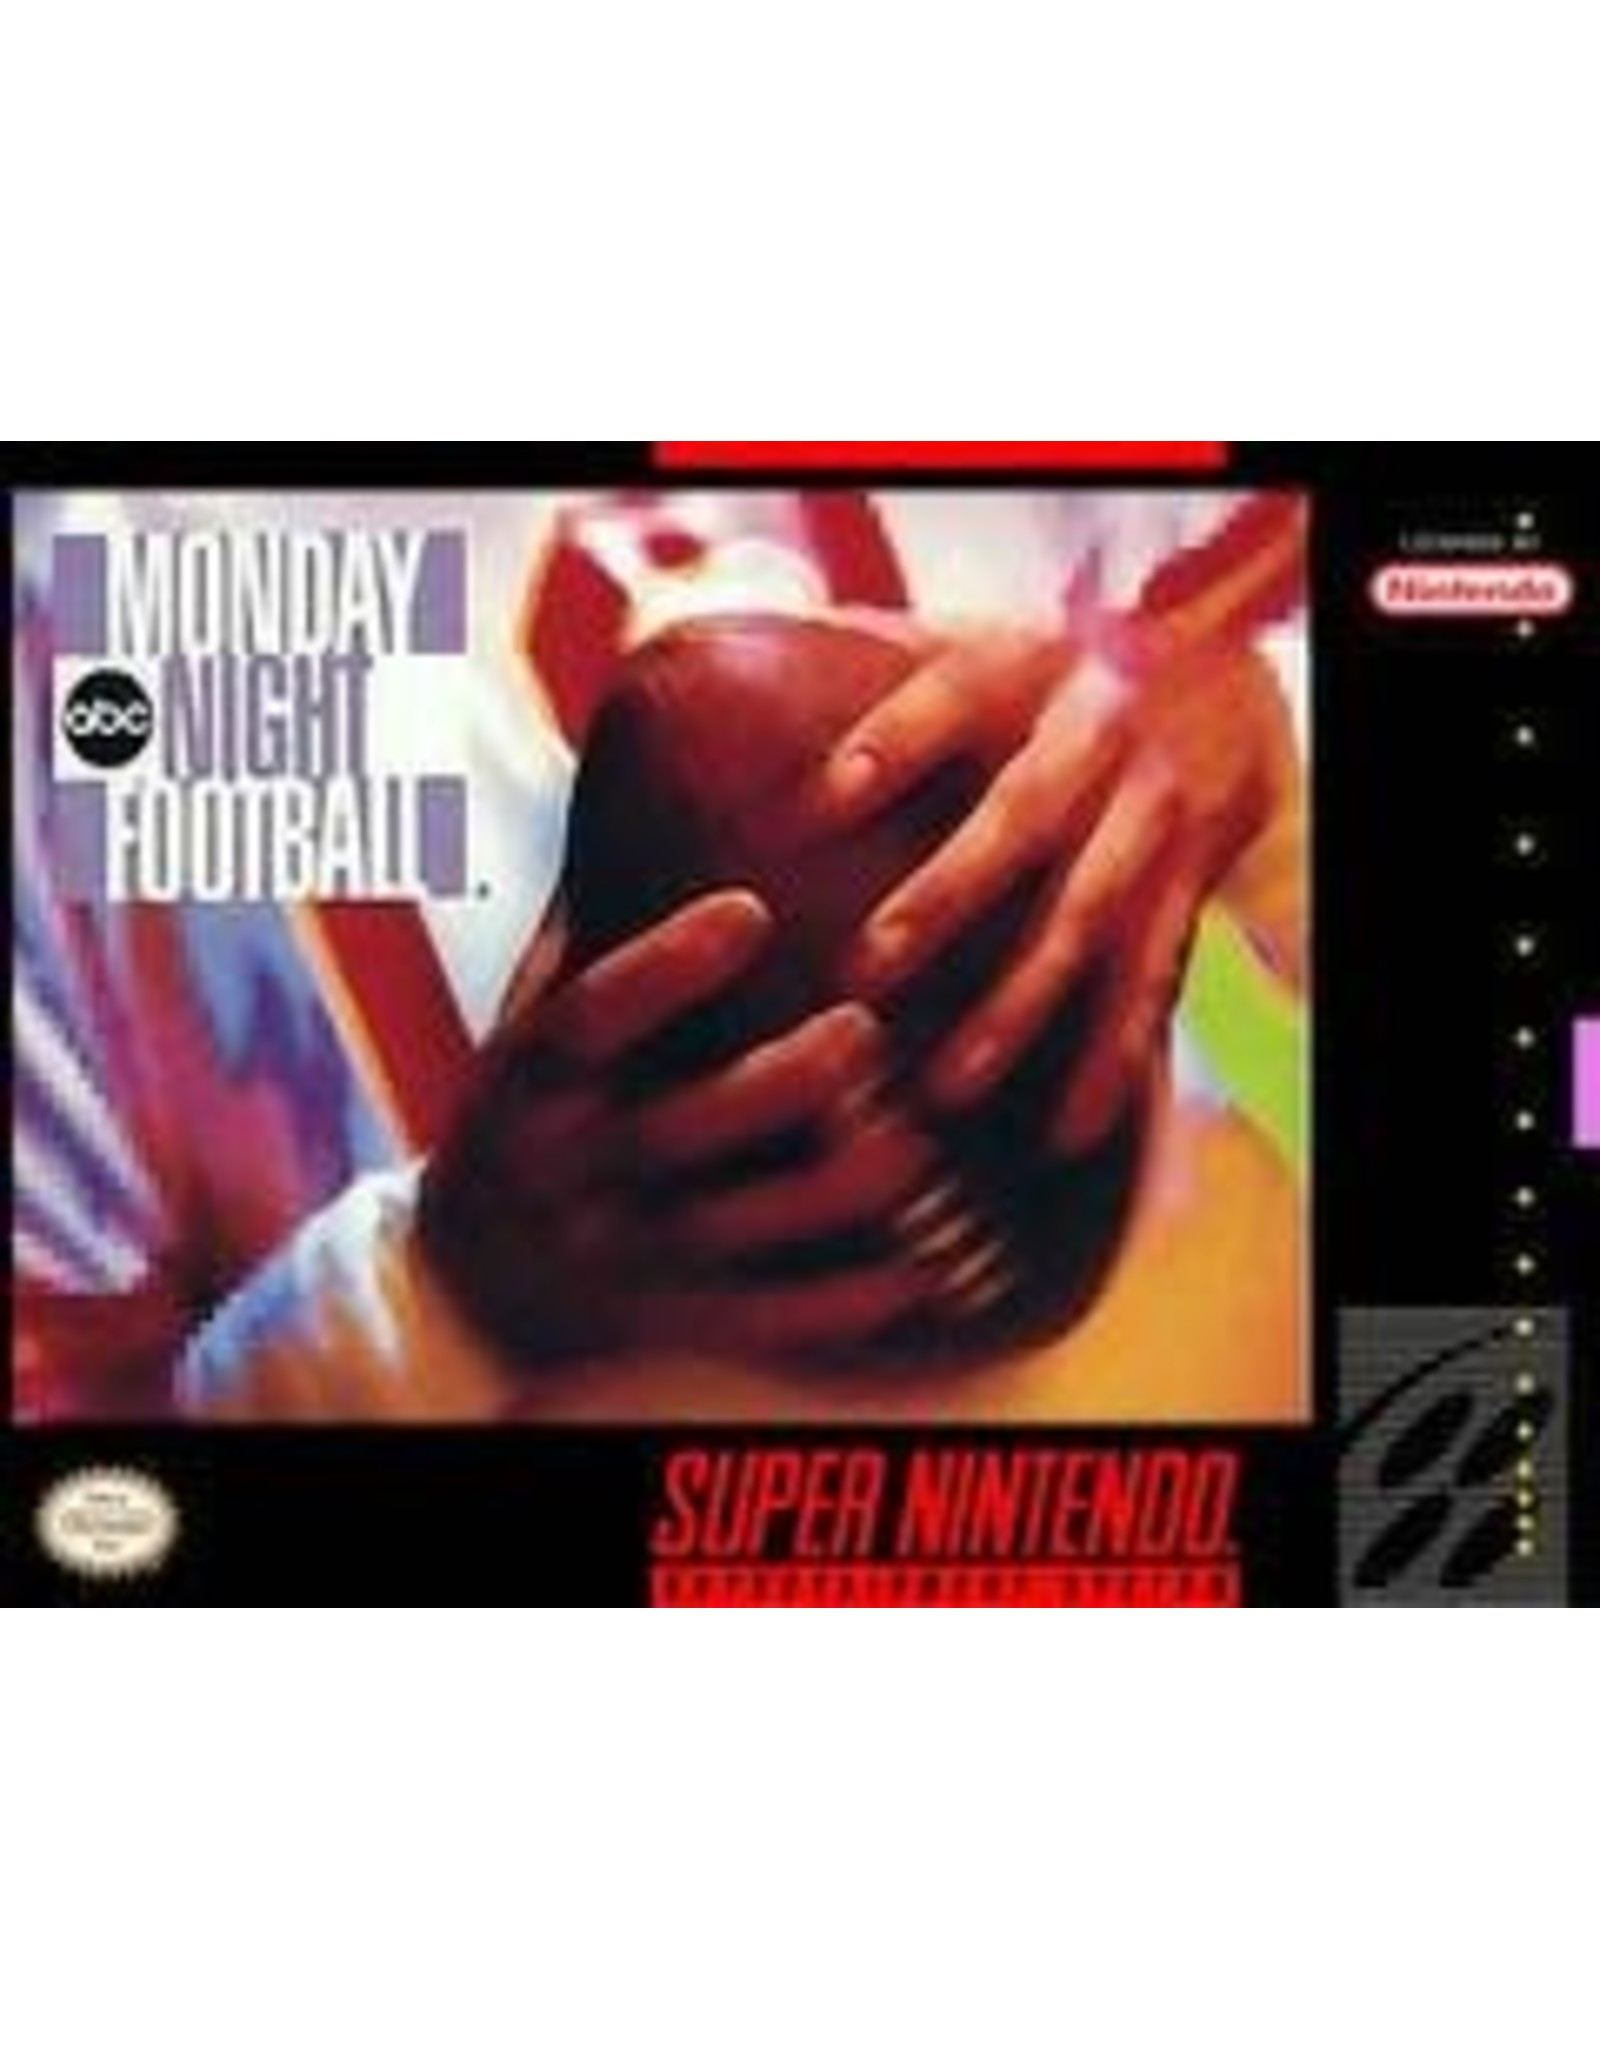 Super Nintendo ABC Monday Night Football (CiB)